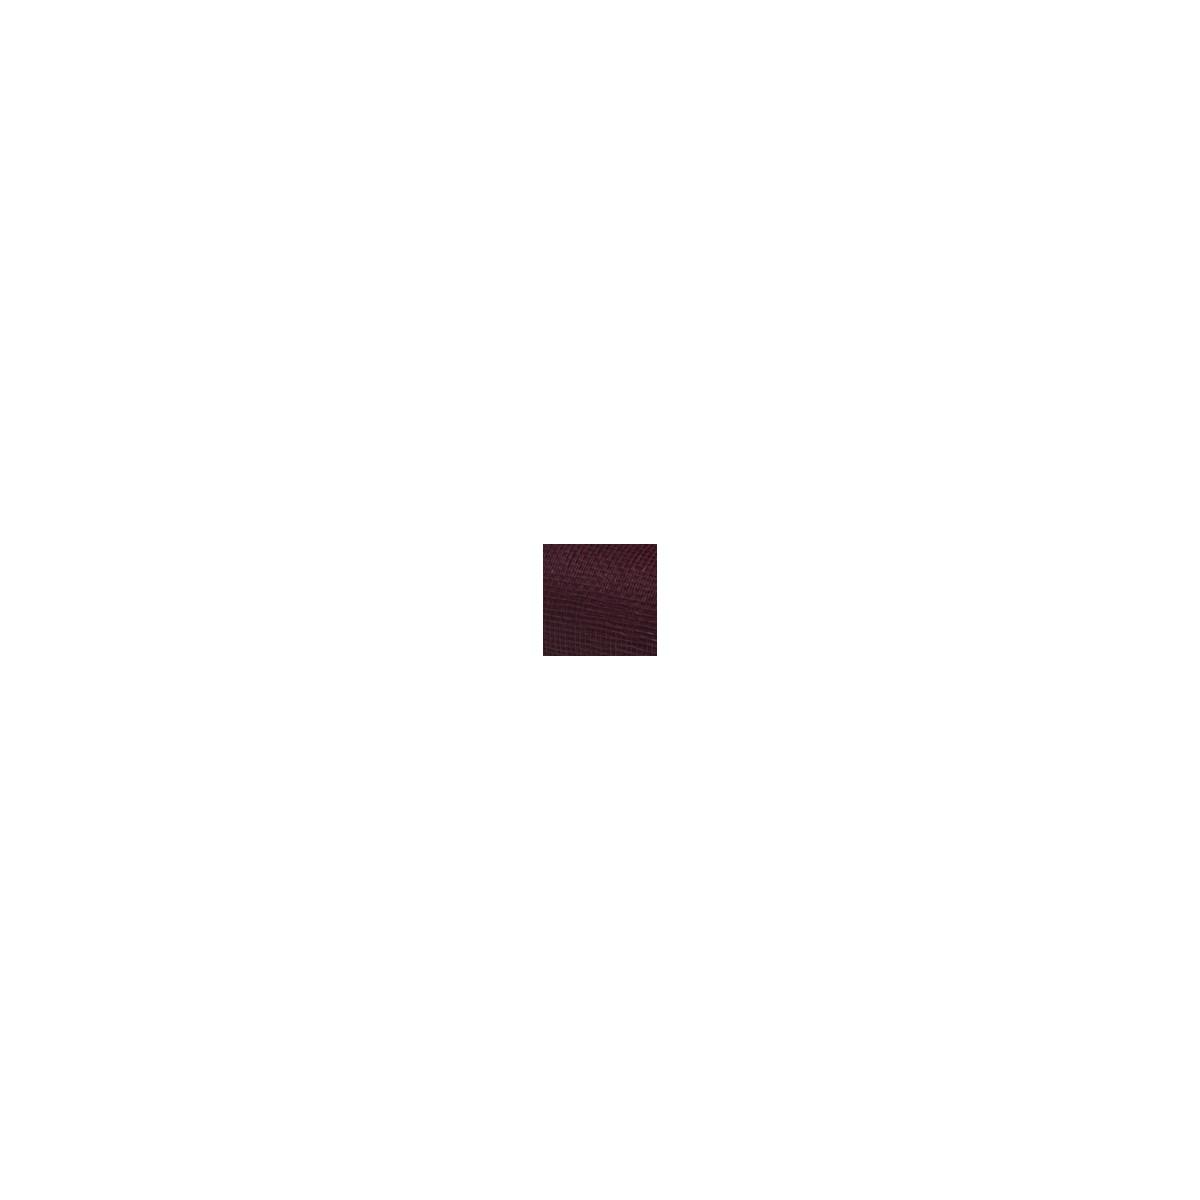 Deconet Telo Retina Cm.54x9,2 Mt. Bordeaux